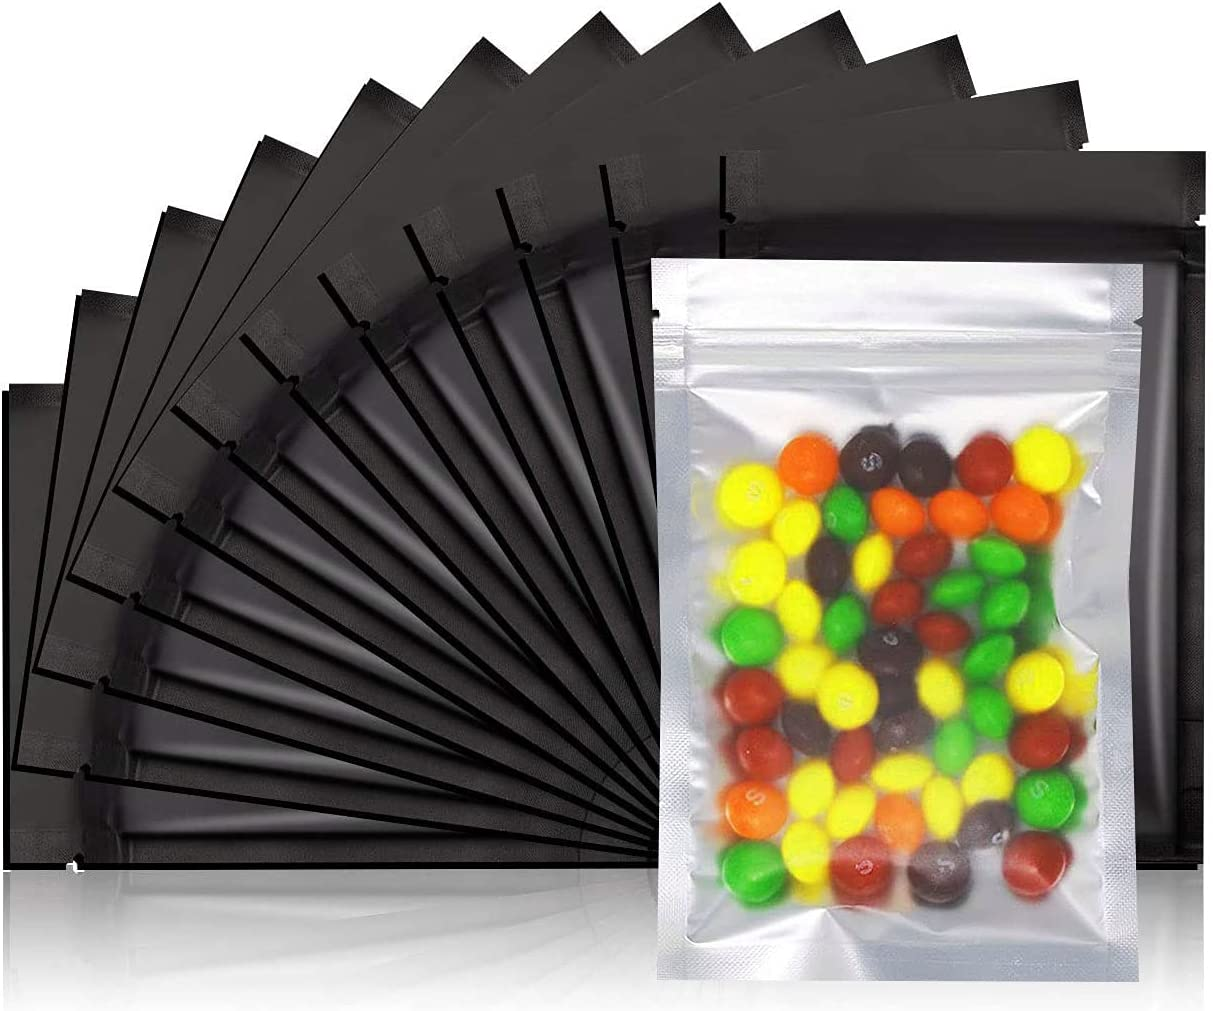 COQOFA 100Pcs 4x6 inch Smell Proof Bags Resealable Ziplock Mylar Bag Front Matte Clear Matte Black Food Safe Storage Foil Pouch Bags